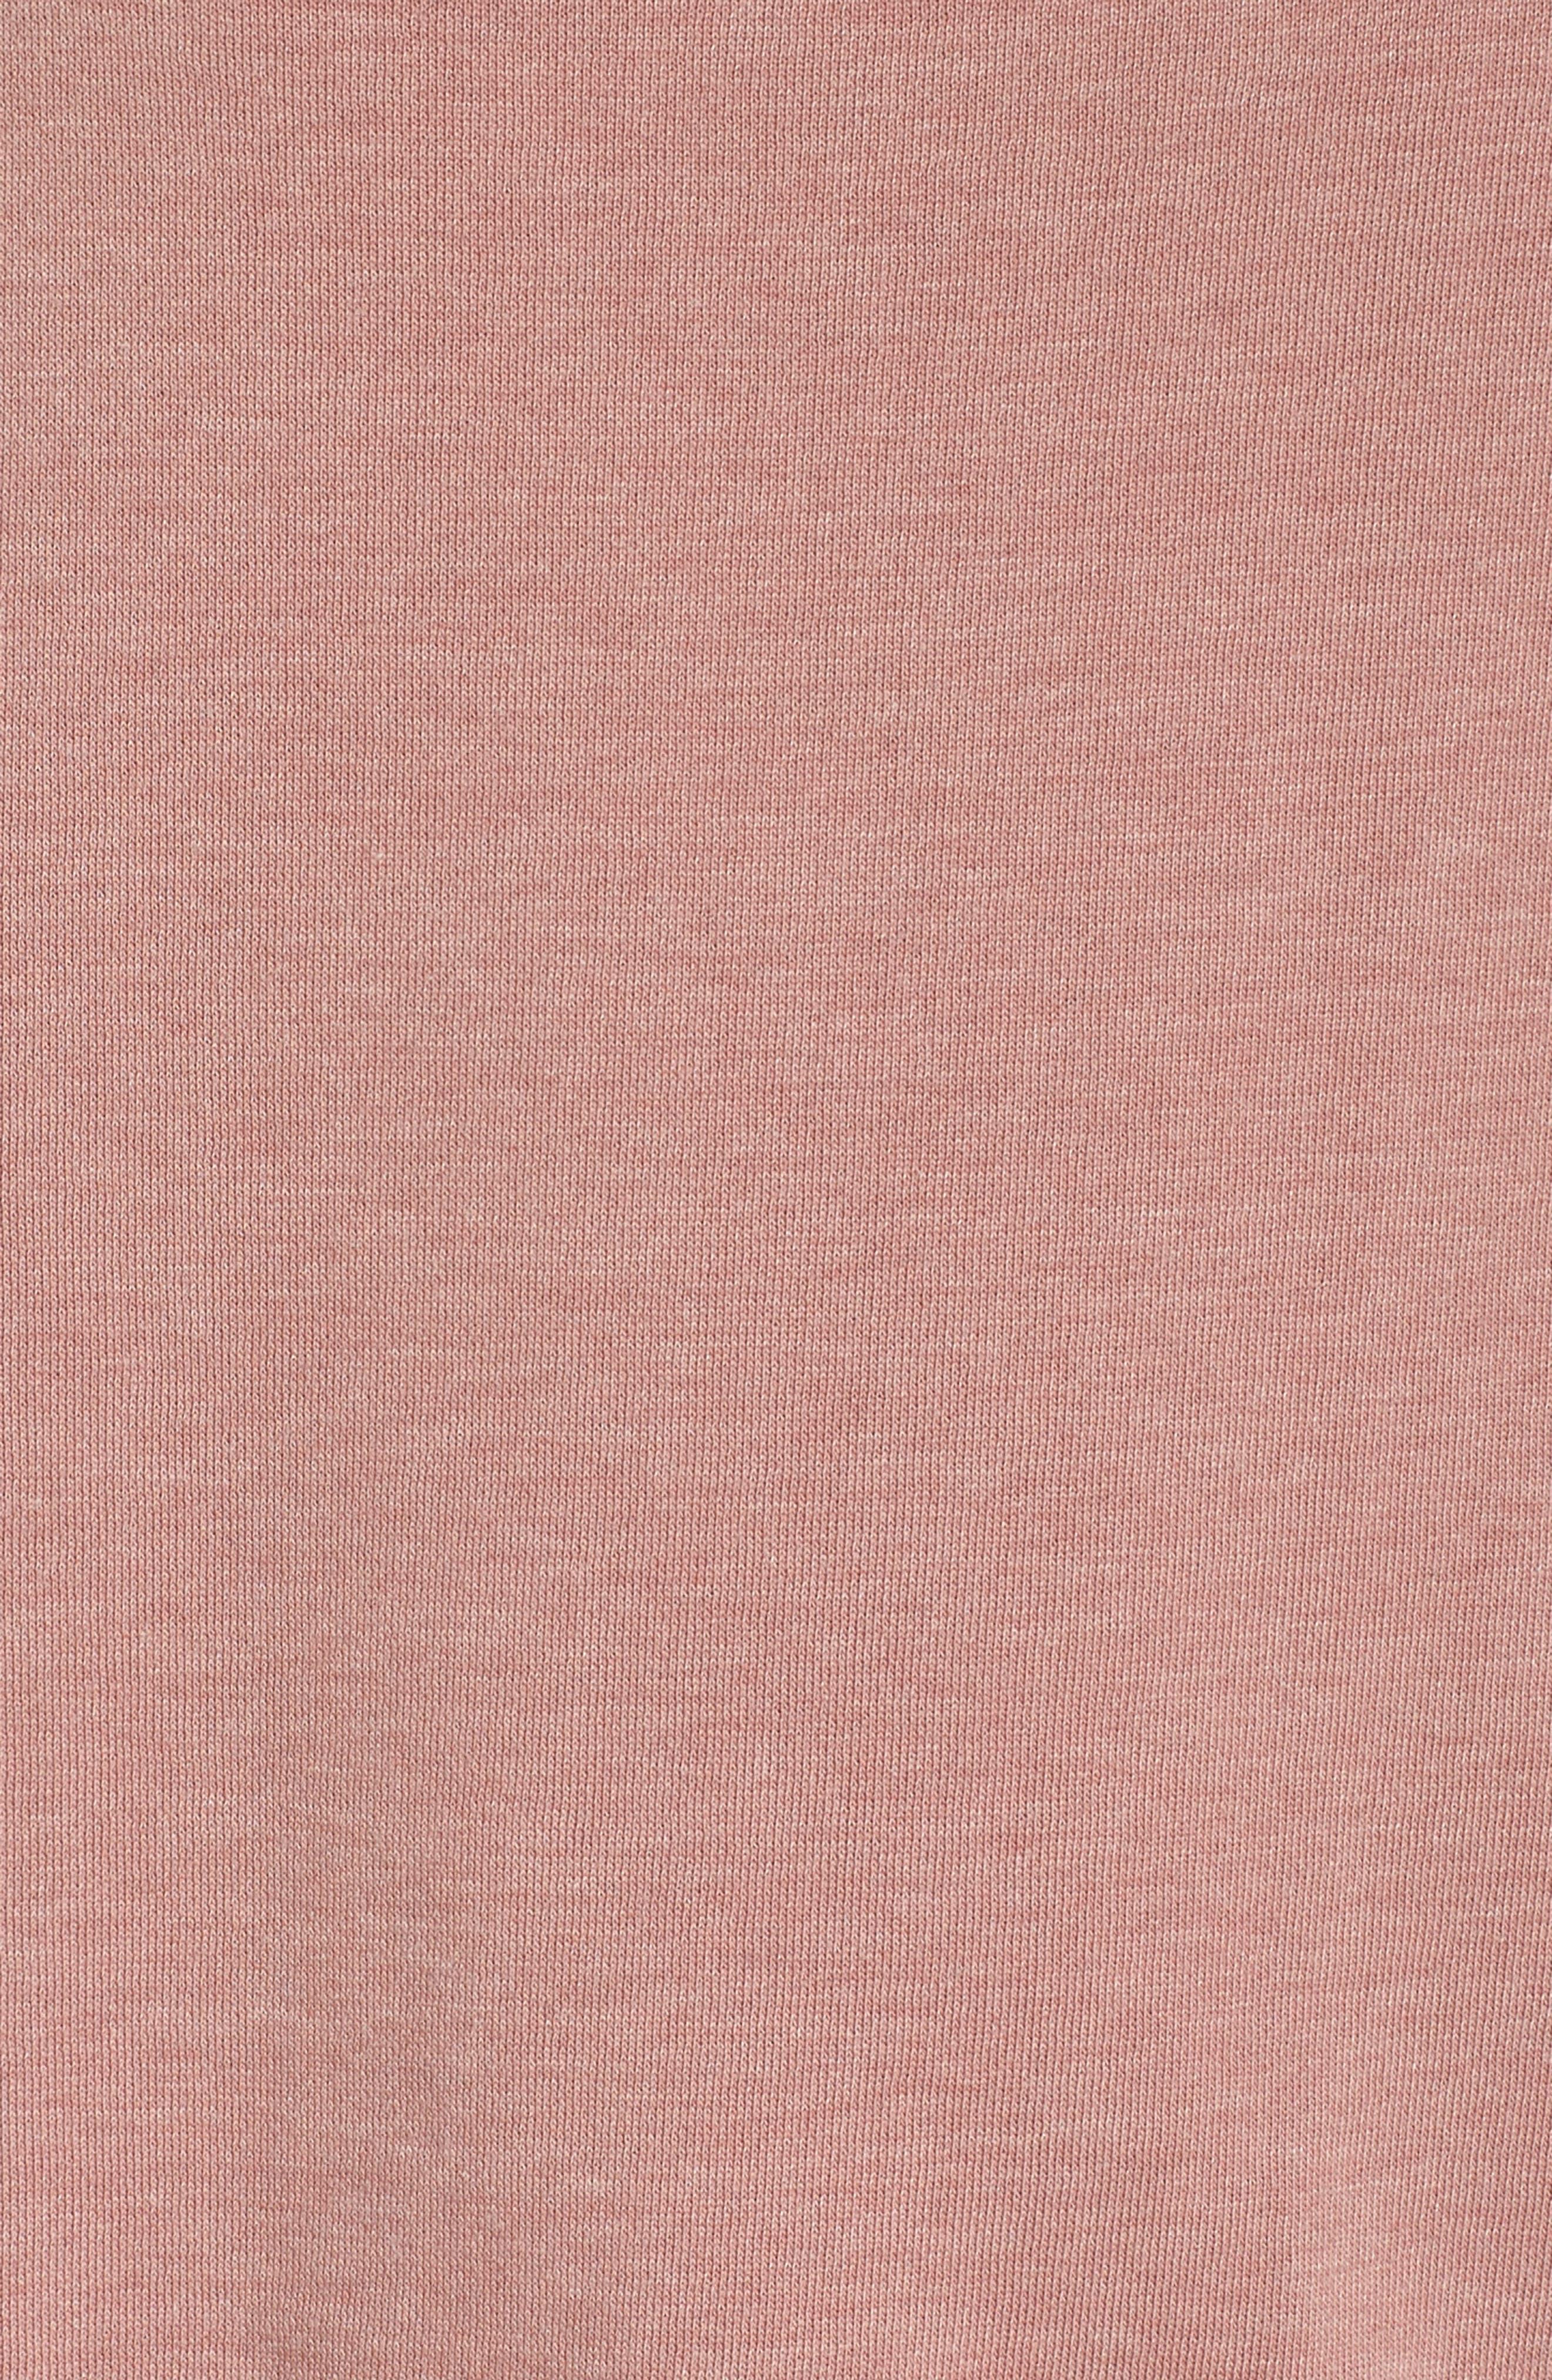 Colder Destroyed Sweatshirt,                             Alternate thumbnail 5, color,                             930